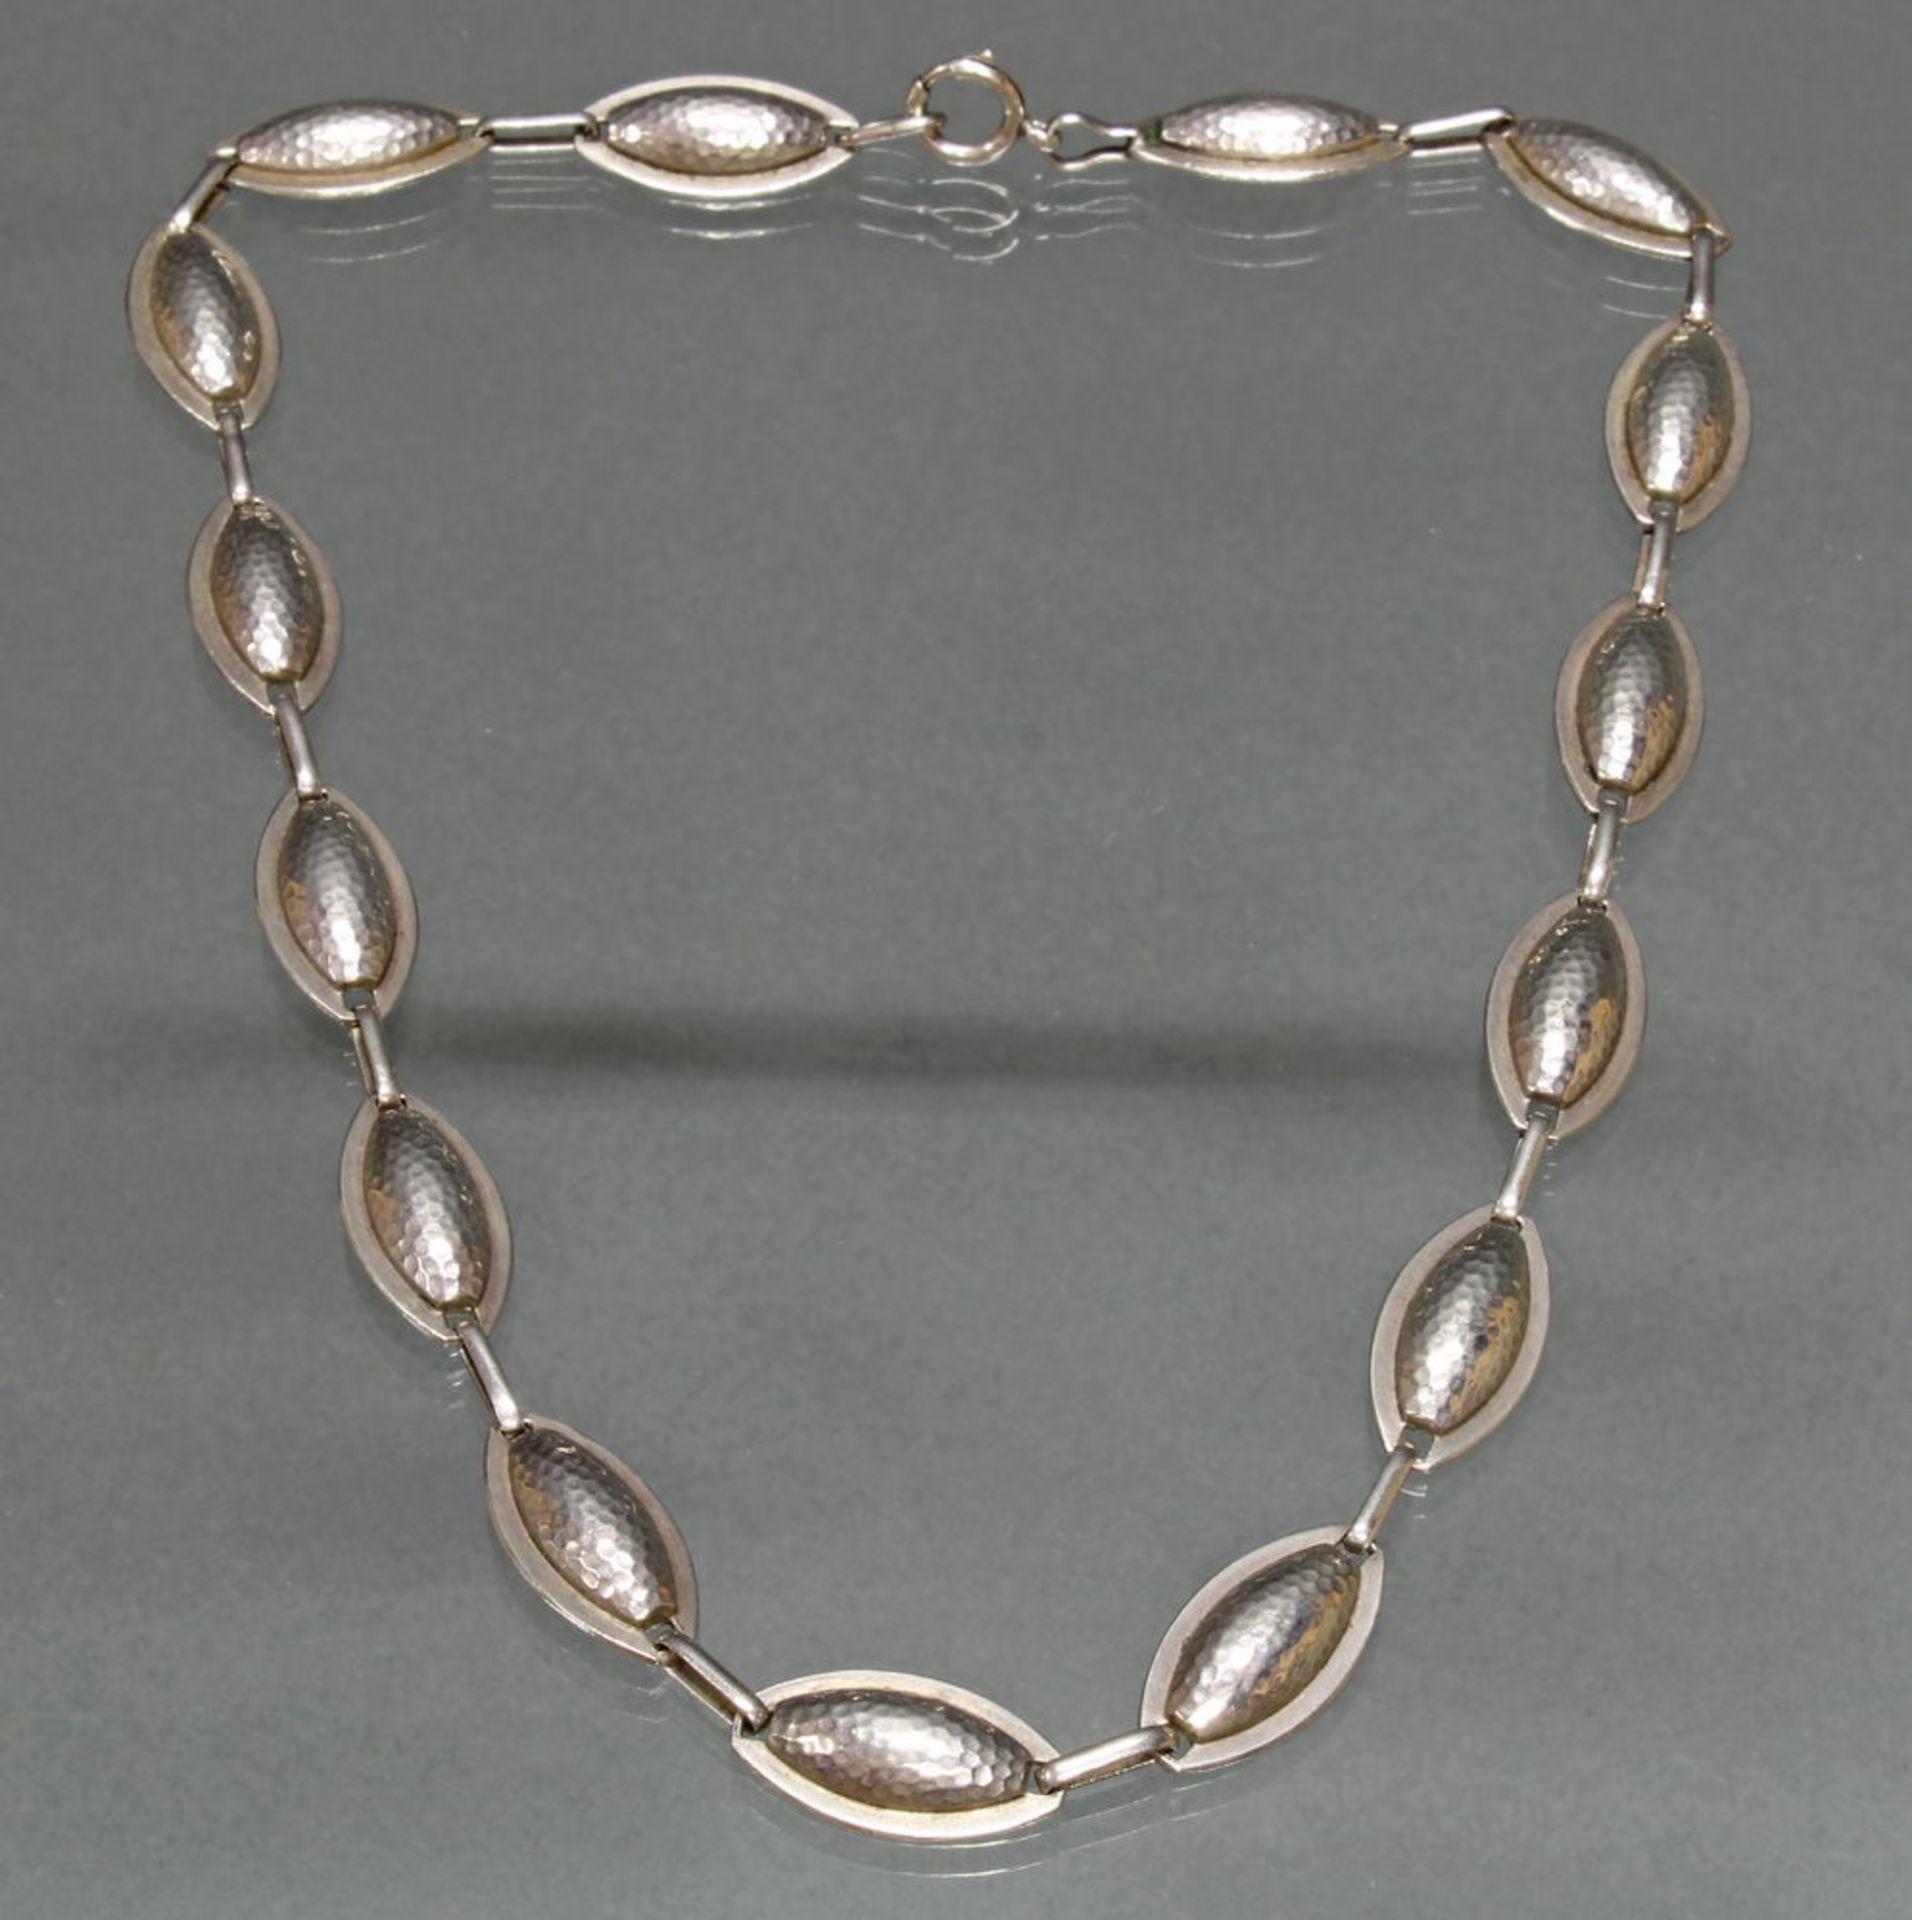 Kette, Silber, 42 cm lang